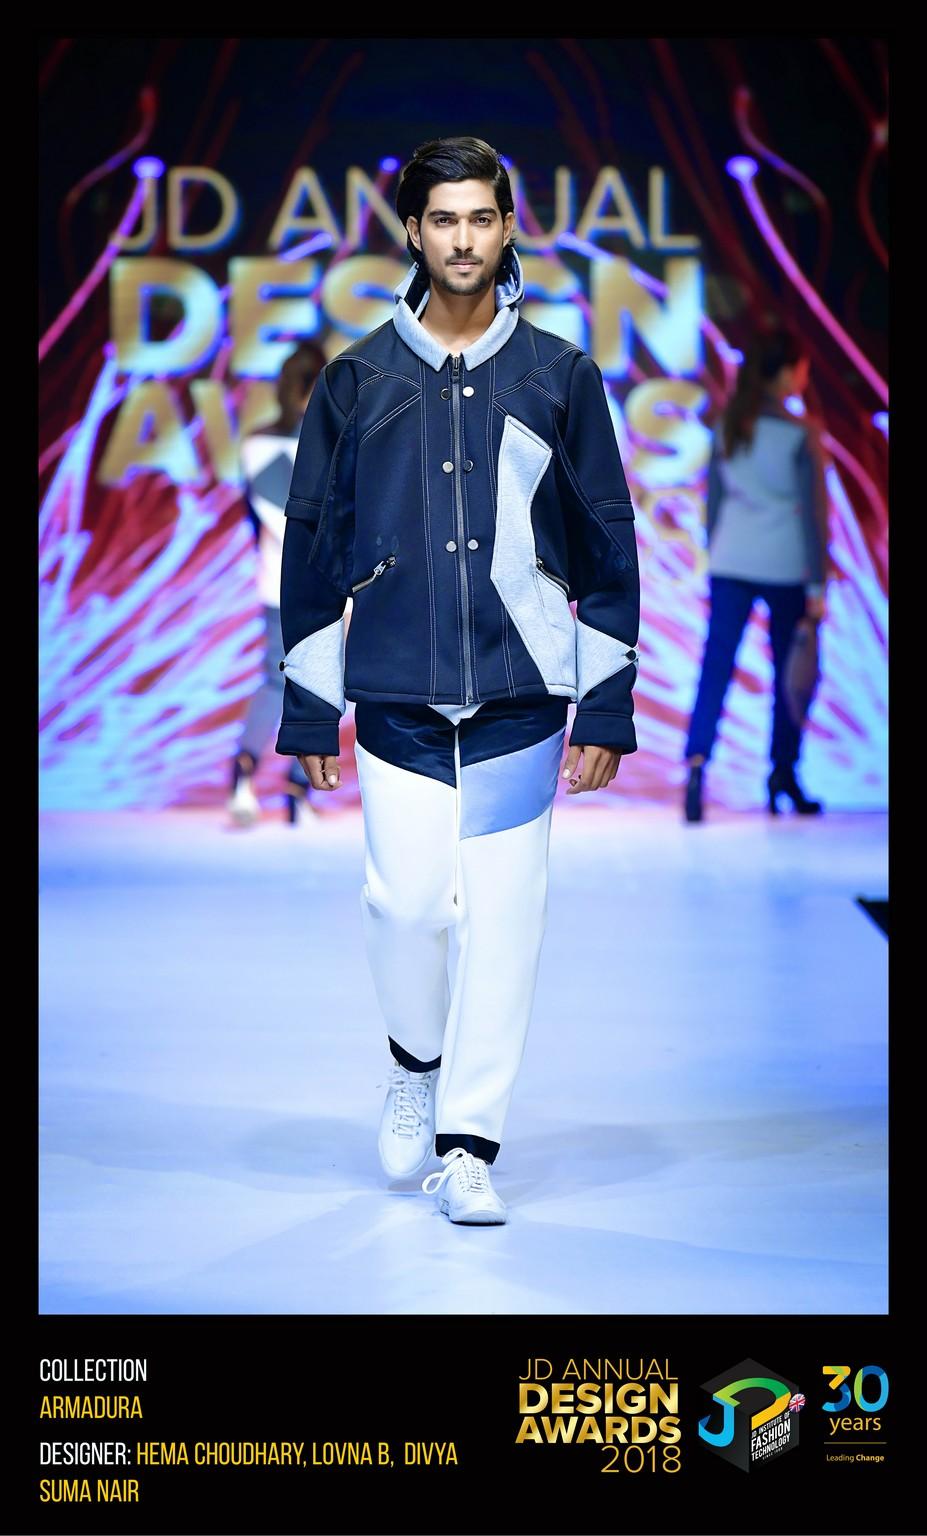 Armadura Collection – Change – JD Annual Design Awards 2018   Designer: Hema, Lovna, Divya   Photography : Jerin Nath (@jerin_nath) armadura collection - ARMADURA6 - Armadura Collection – Change – JD Annual Design Awards 2018